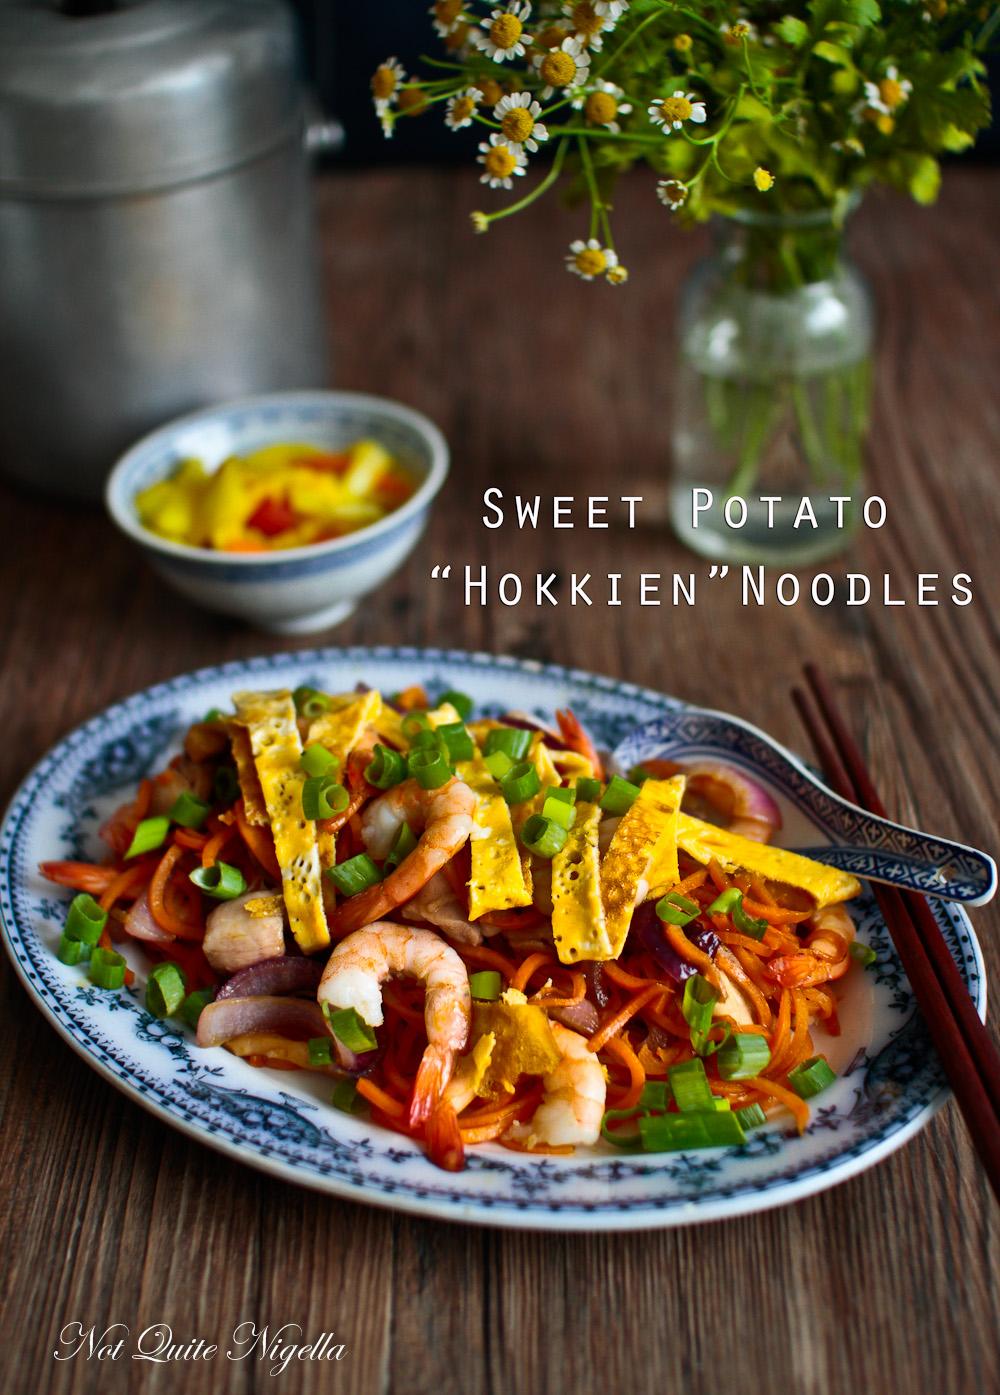 Sweet Potato Hokkien Noodles